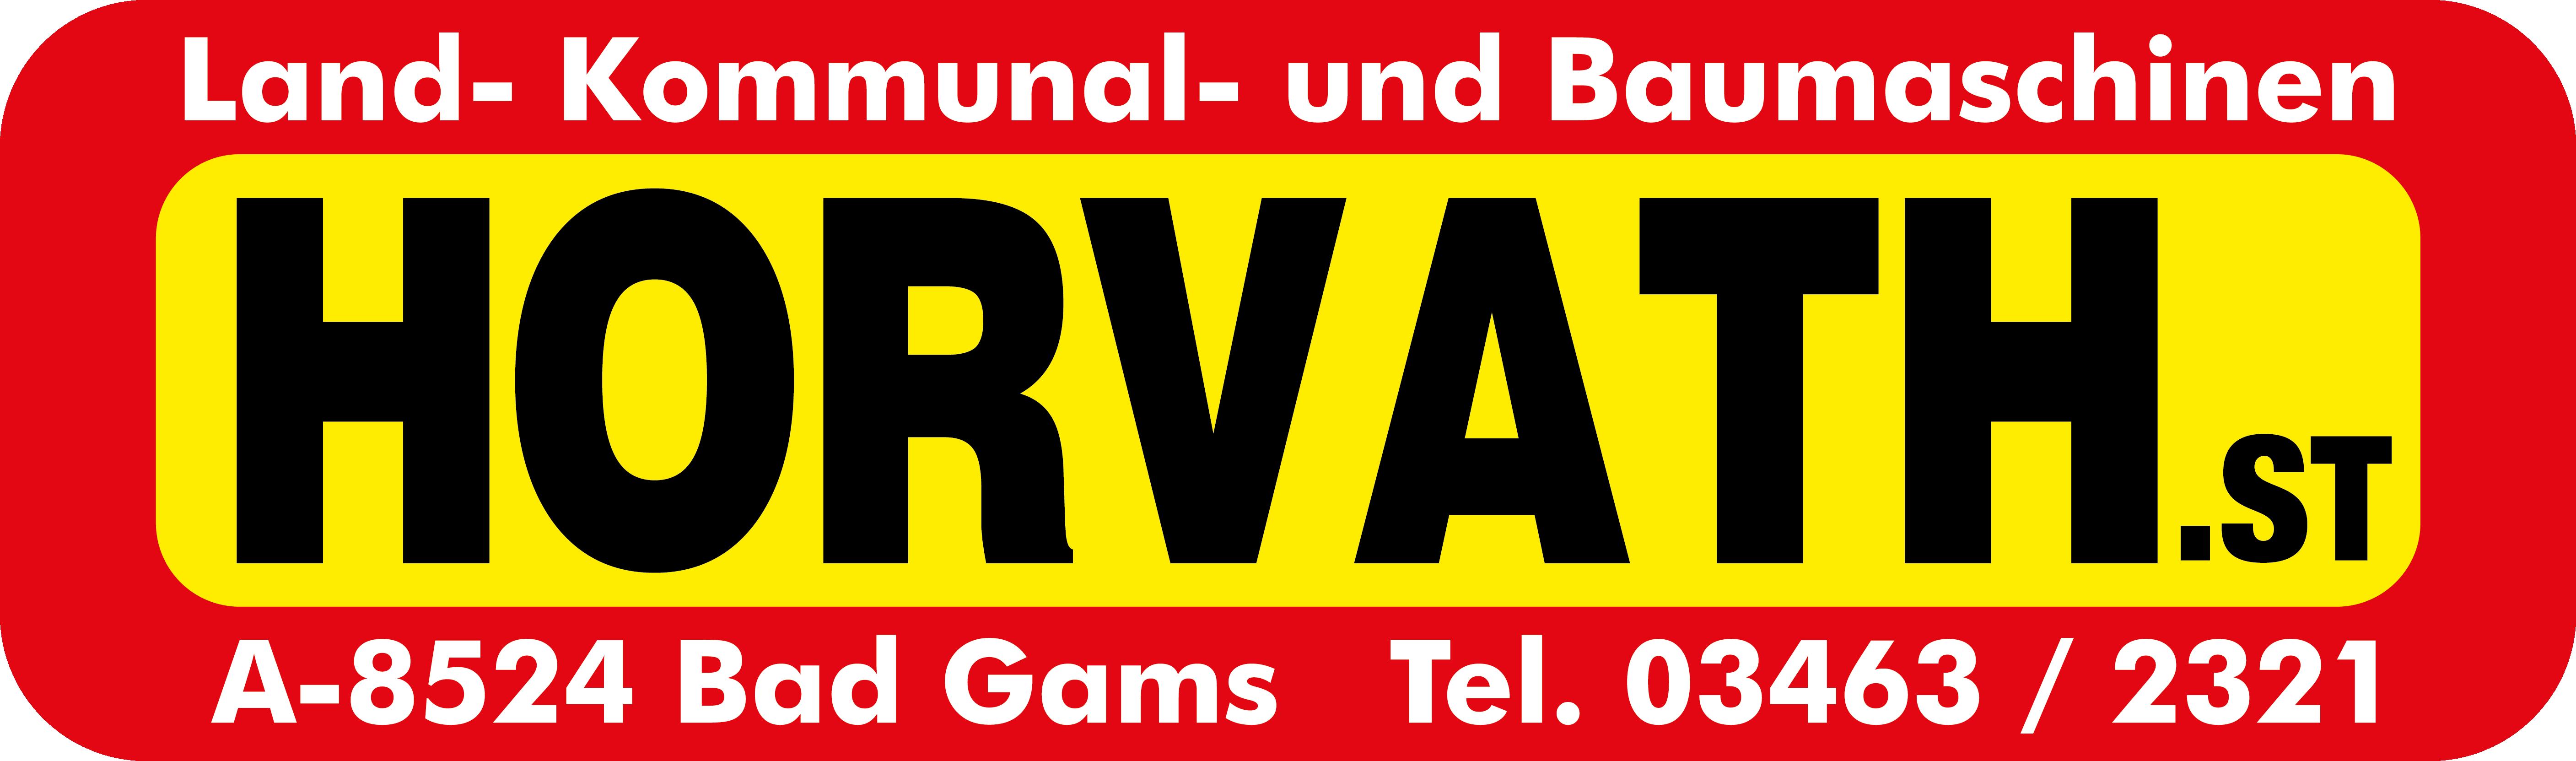 Logo HORVATH